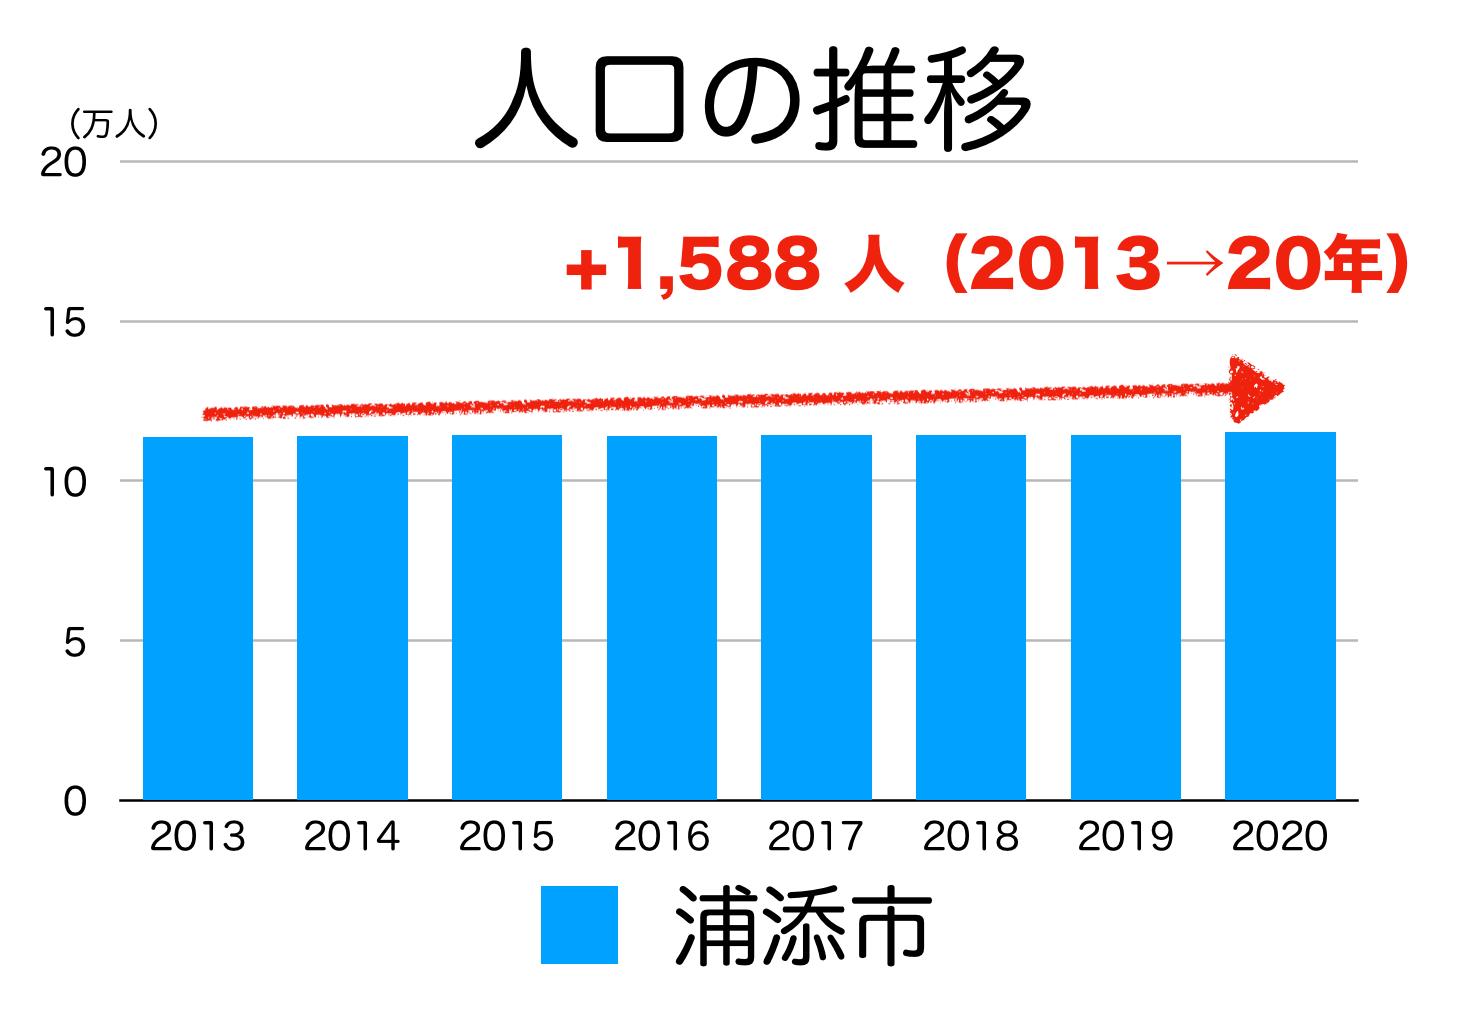 浦添市の人口推移